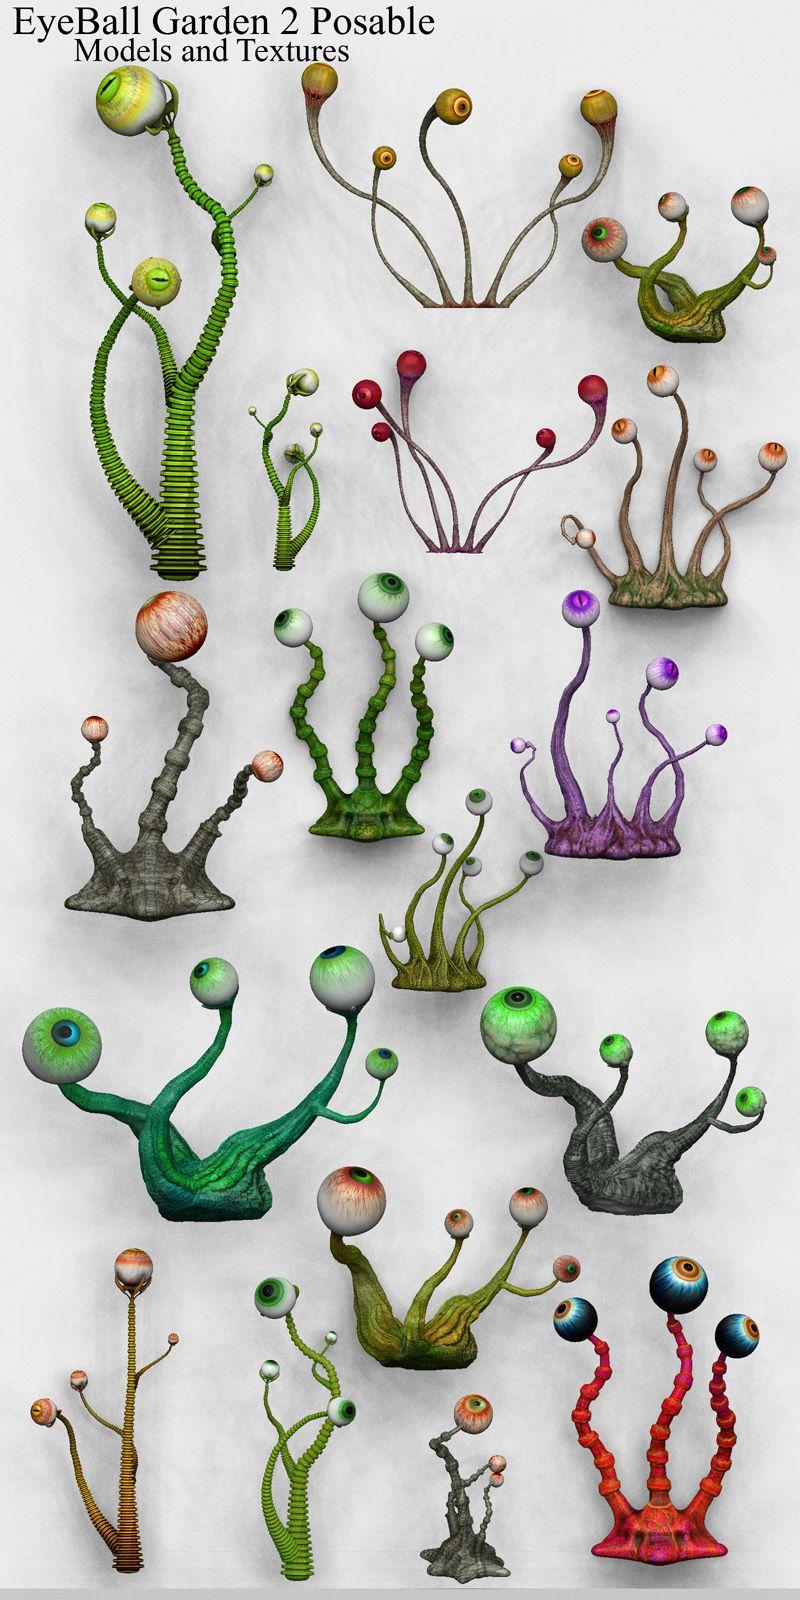 Photo of EyeBall Garden 2 Posable Themed Characters Animals Accessories Poisen